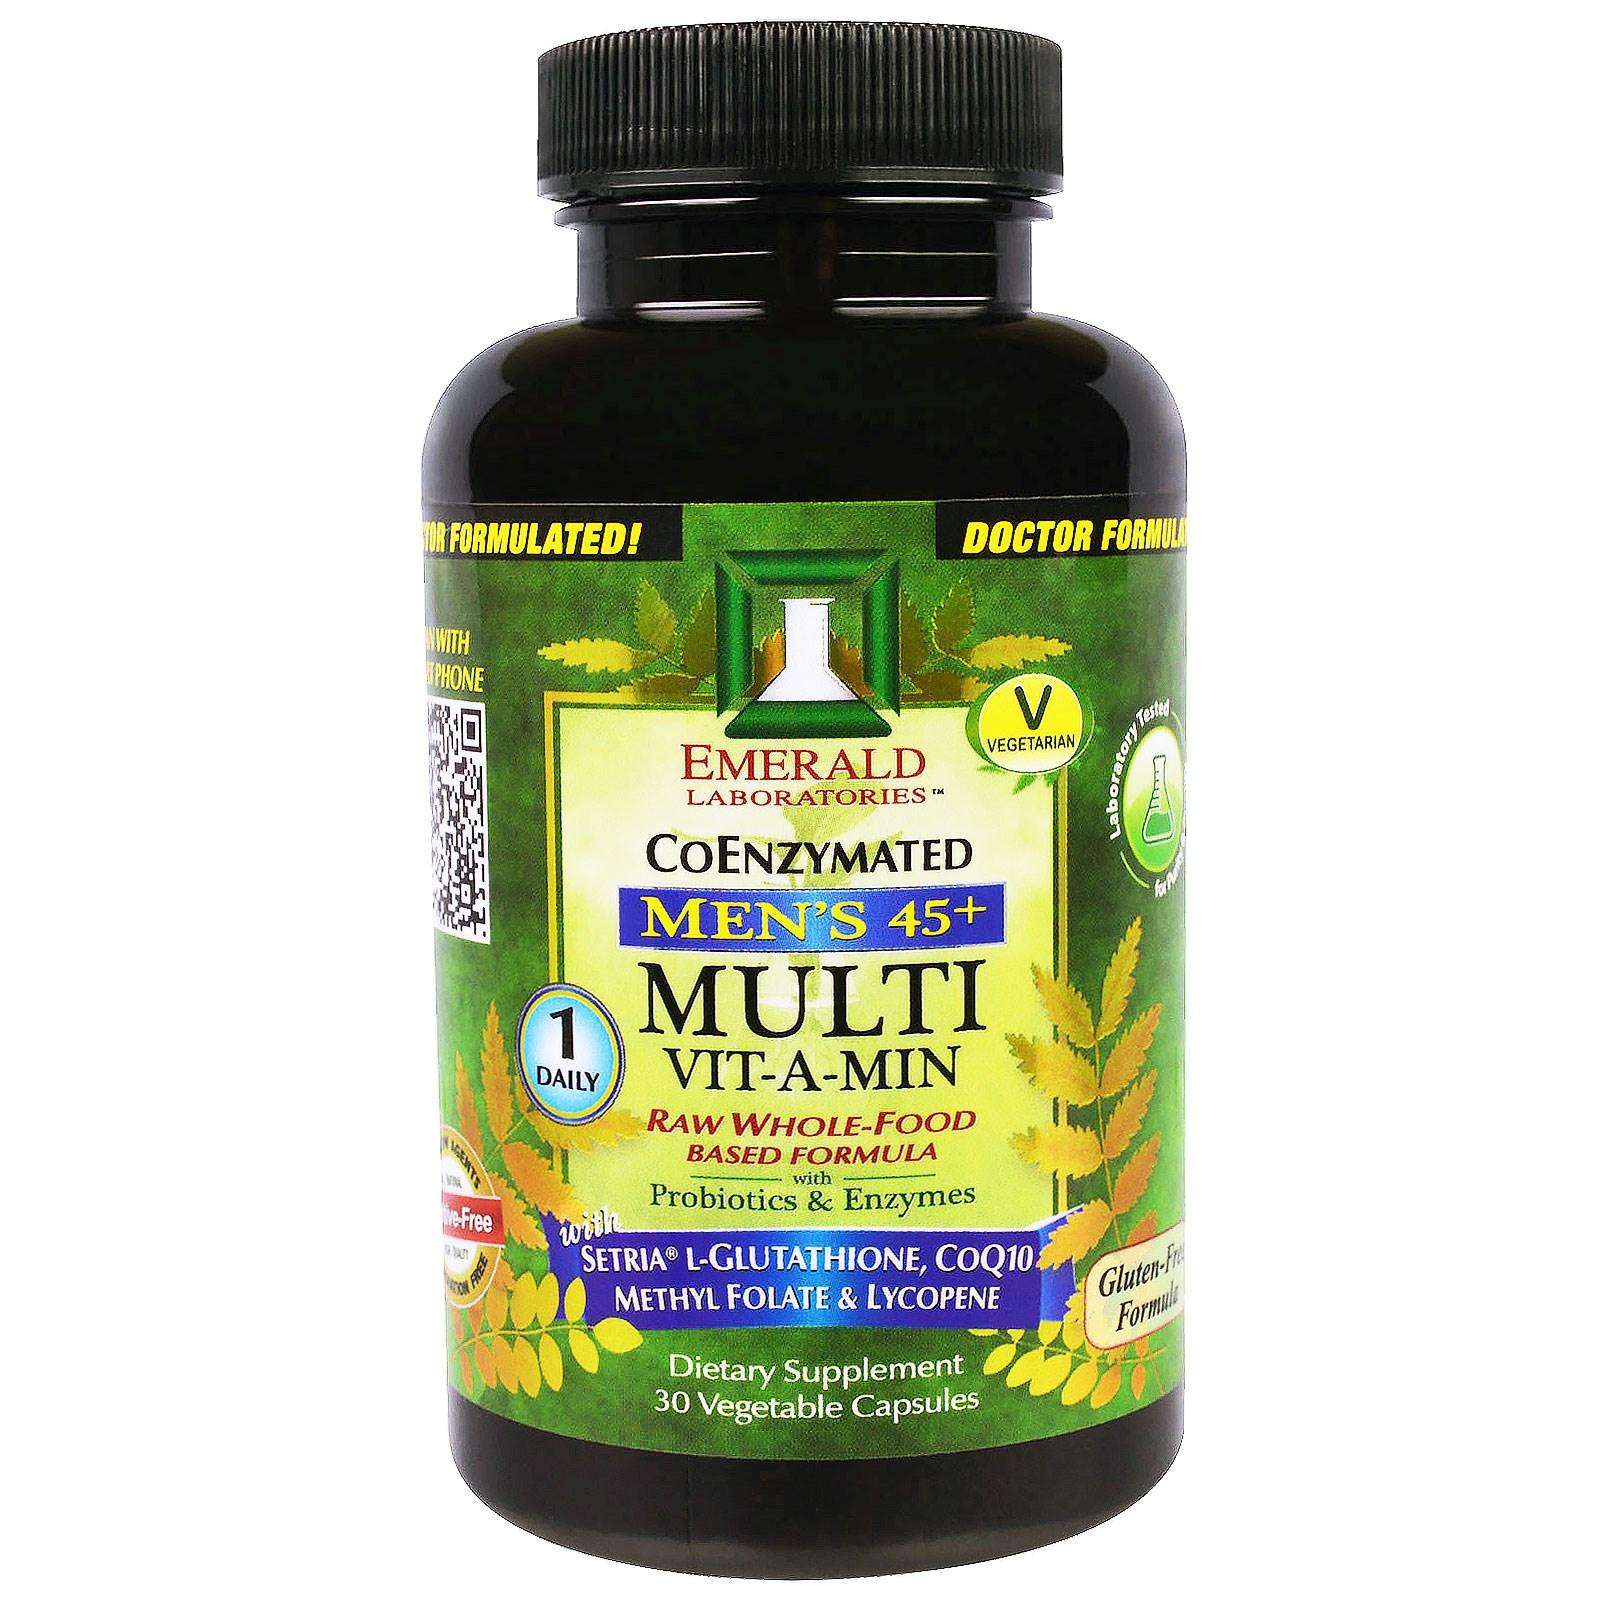 Emerald Laboratories, Multi Vit-A-Min, мультивитамины для мужчин 45+, по 1 капсуле в день, 30 вегетарианских капсул